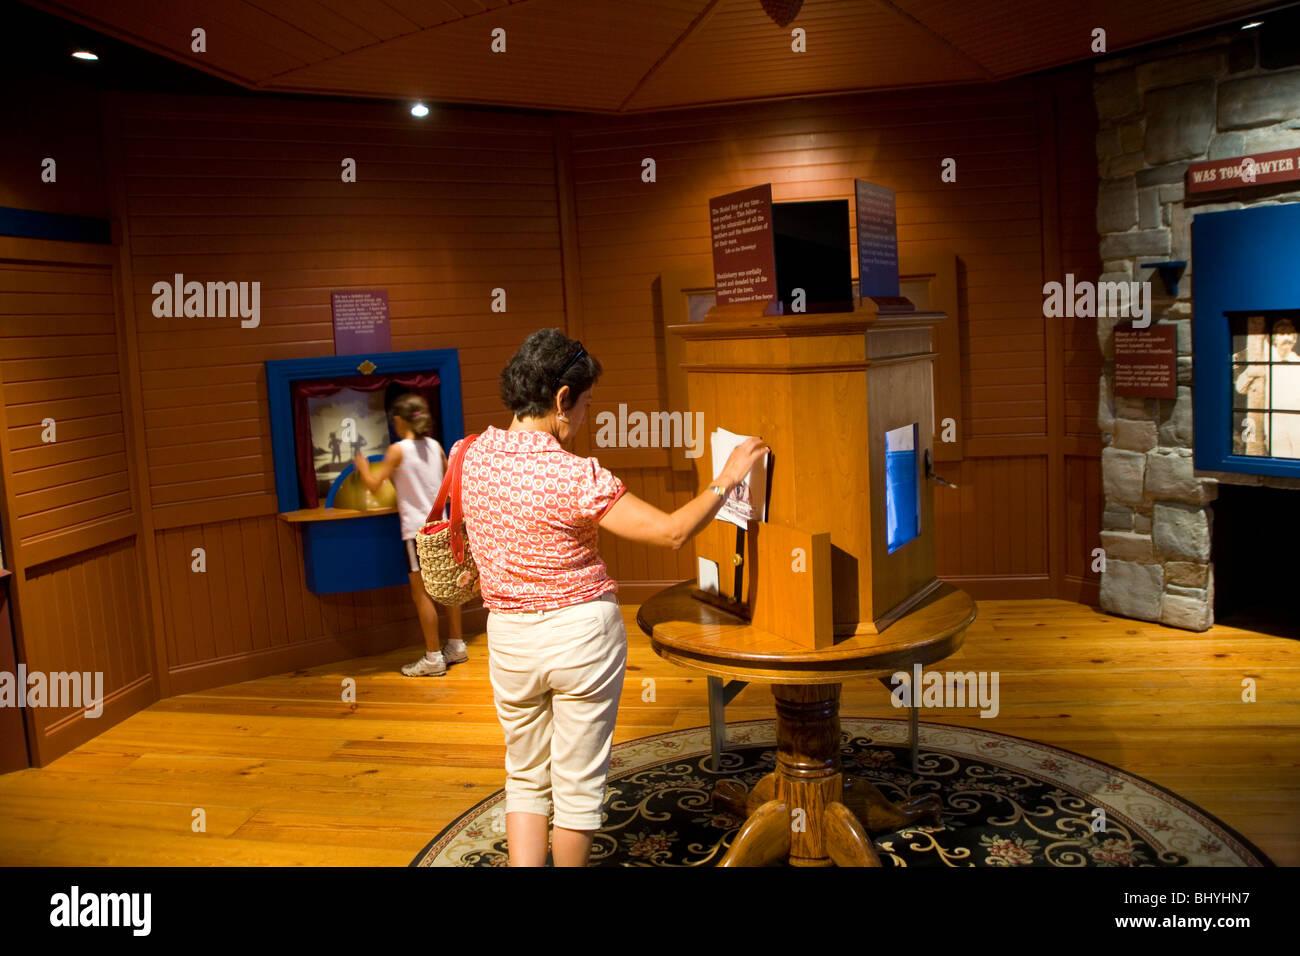 Mark Twain Interpretive Center in Hannibal, Missouri - Stock Image